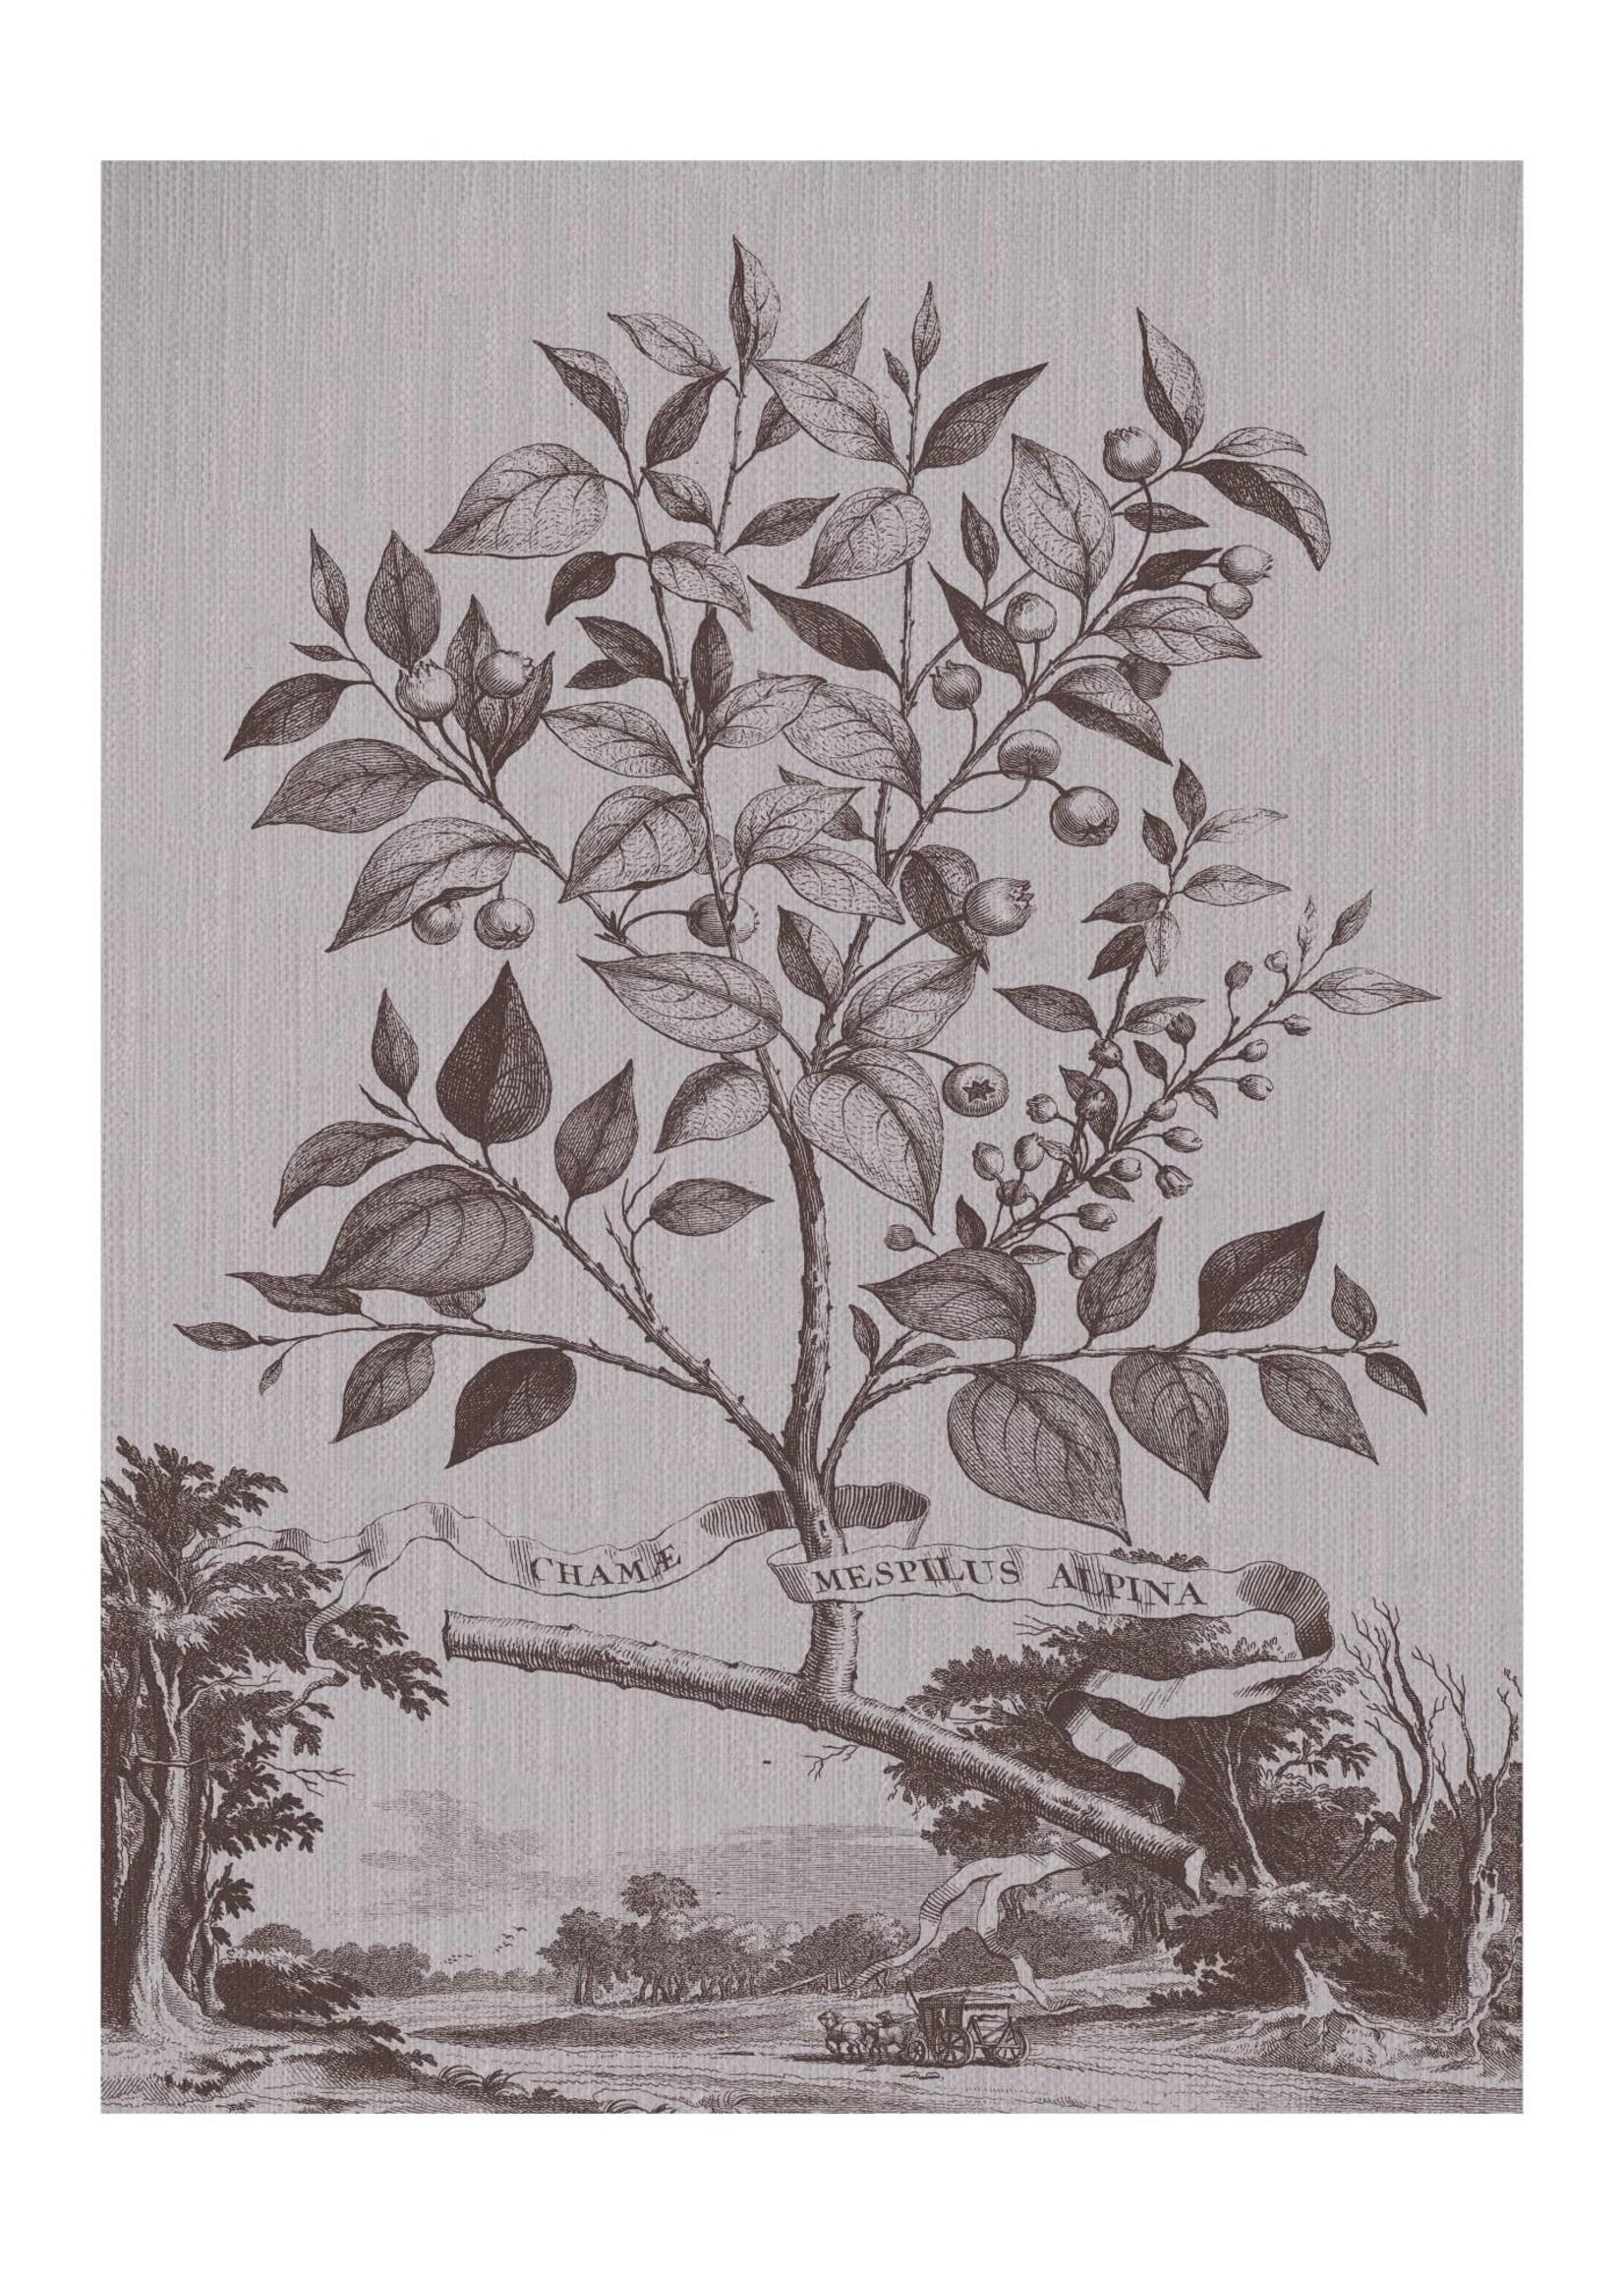 Muntings Tree-Botanical